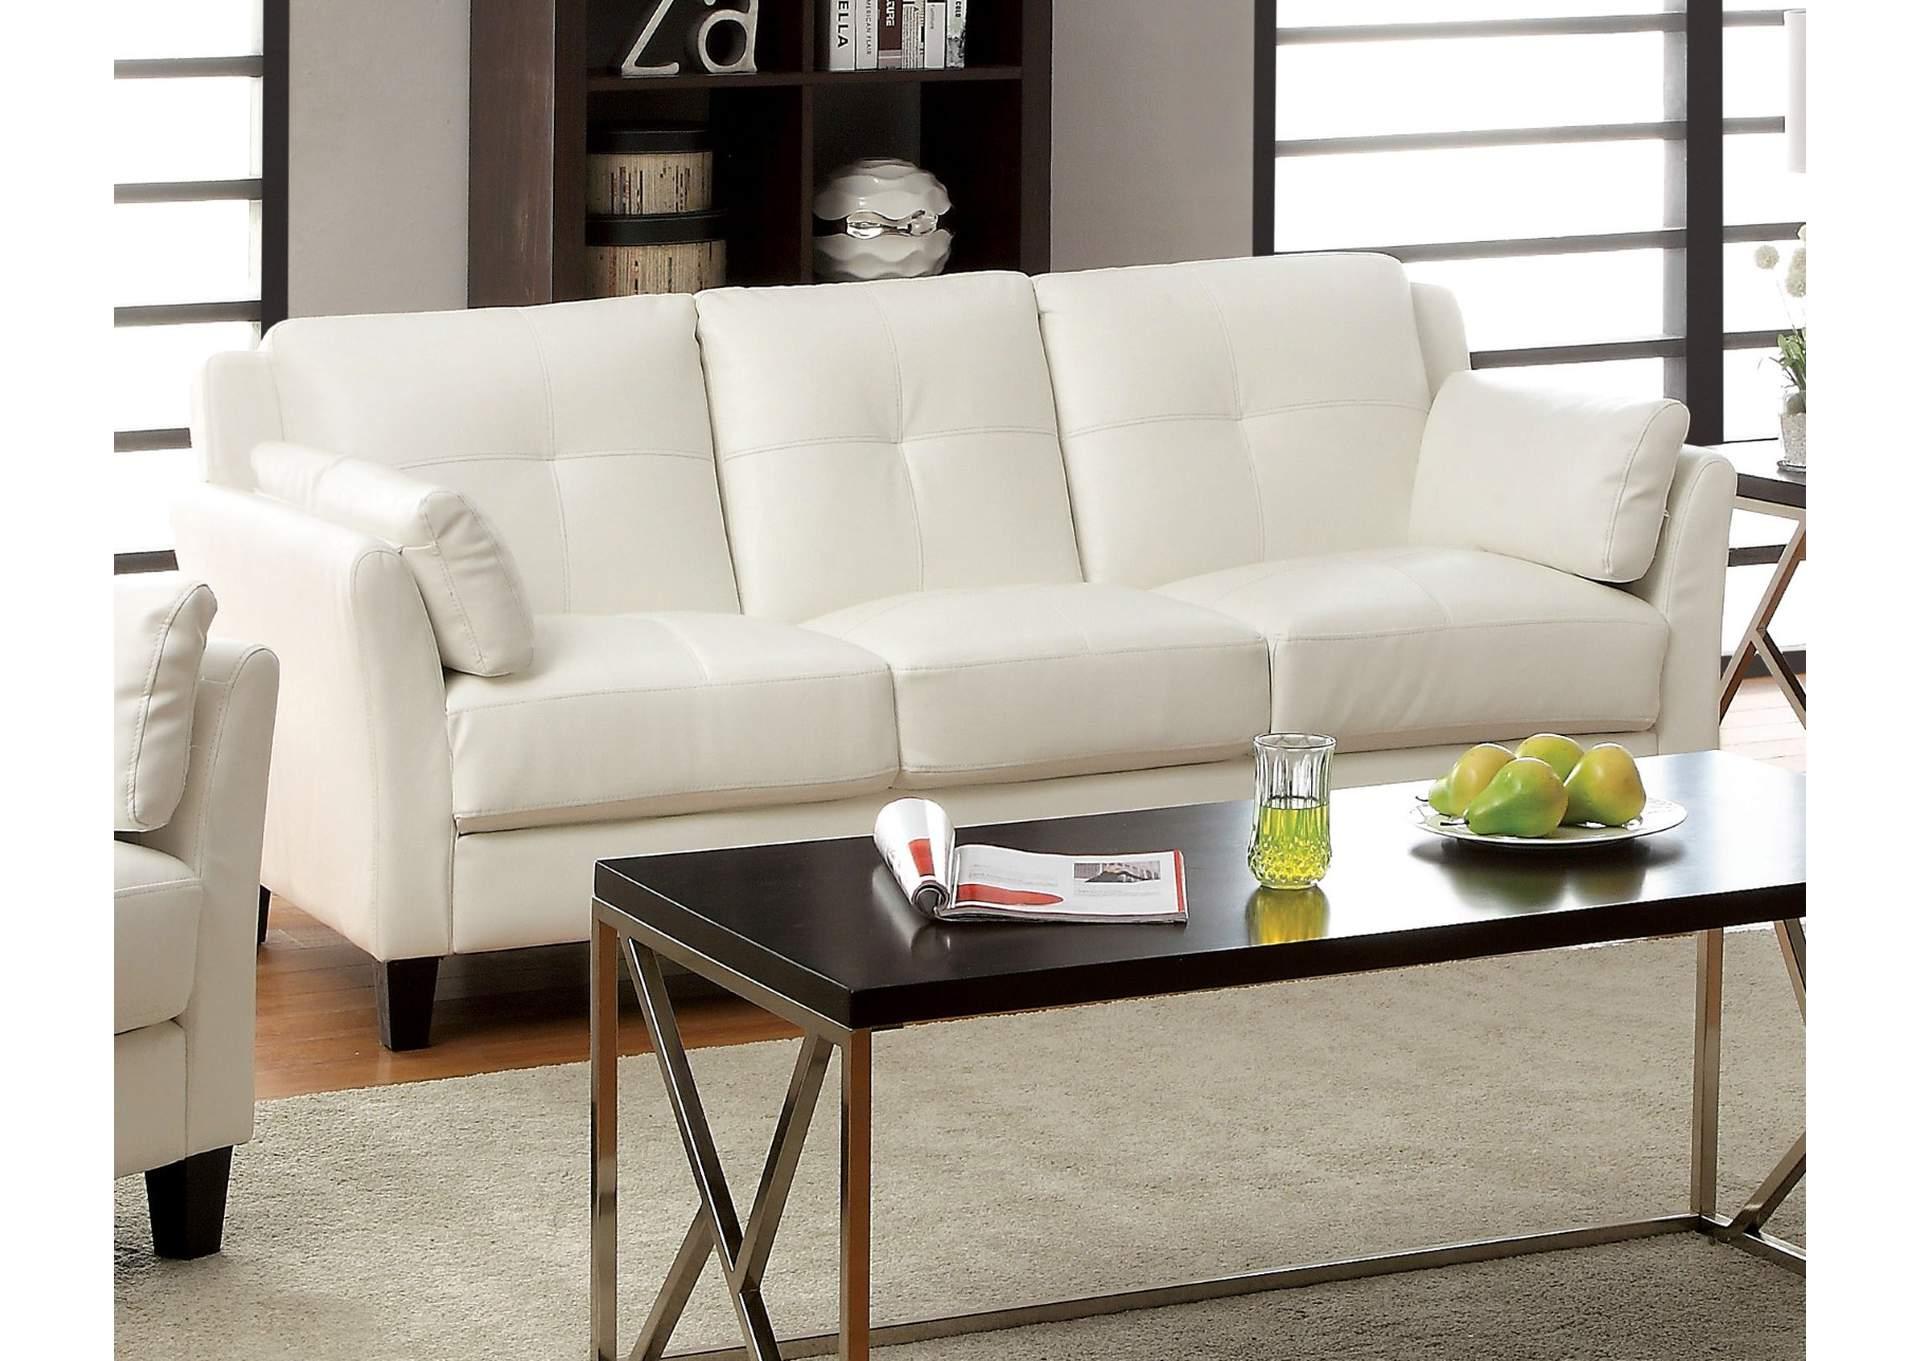 Pierre White Sofa,Furniture Of America